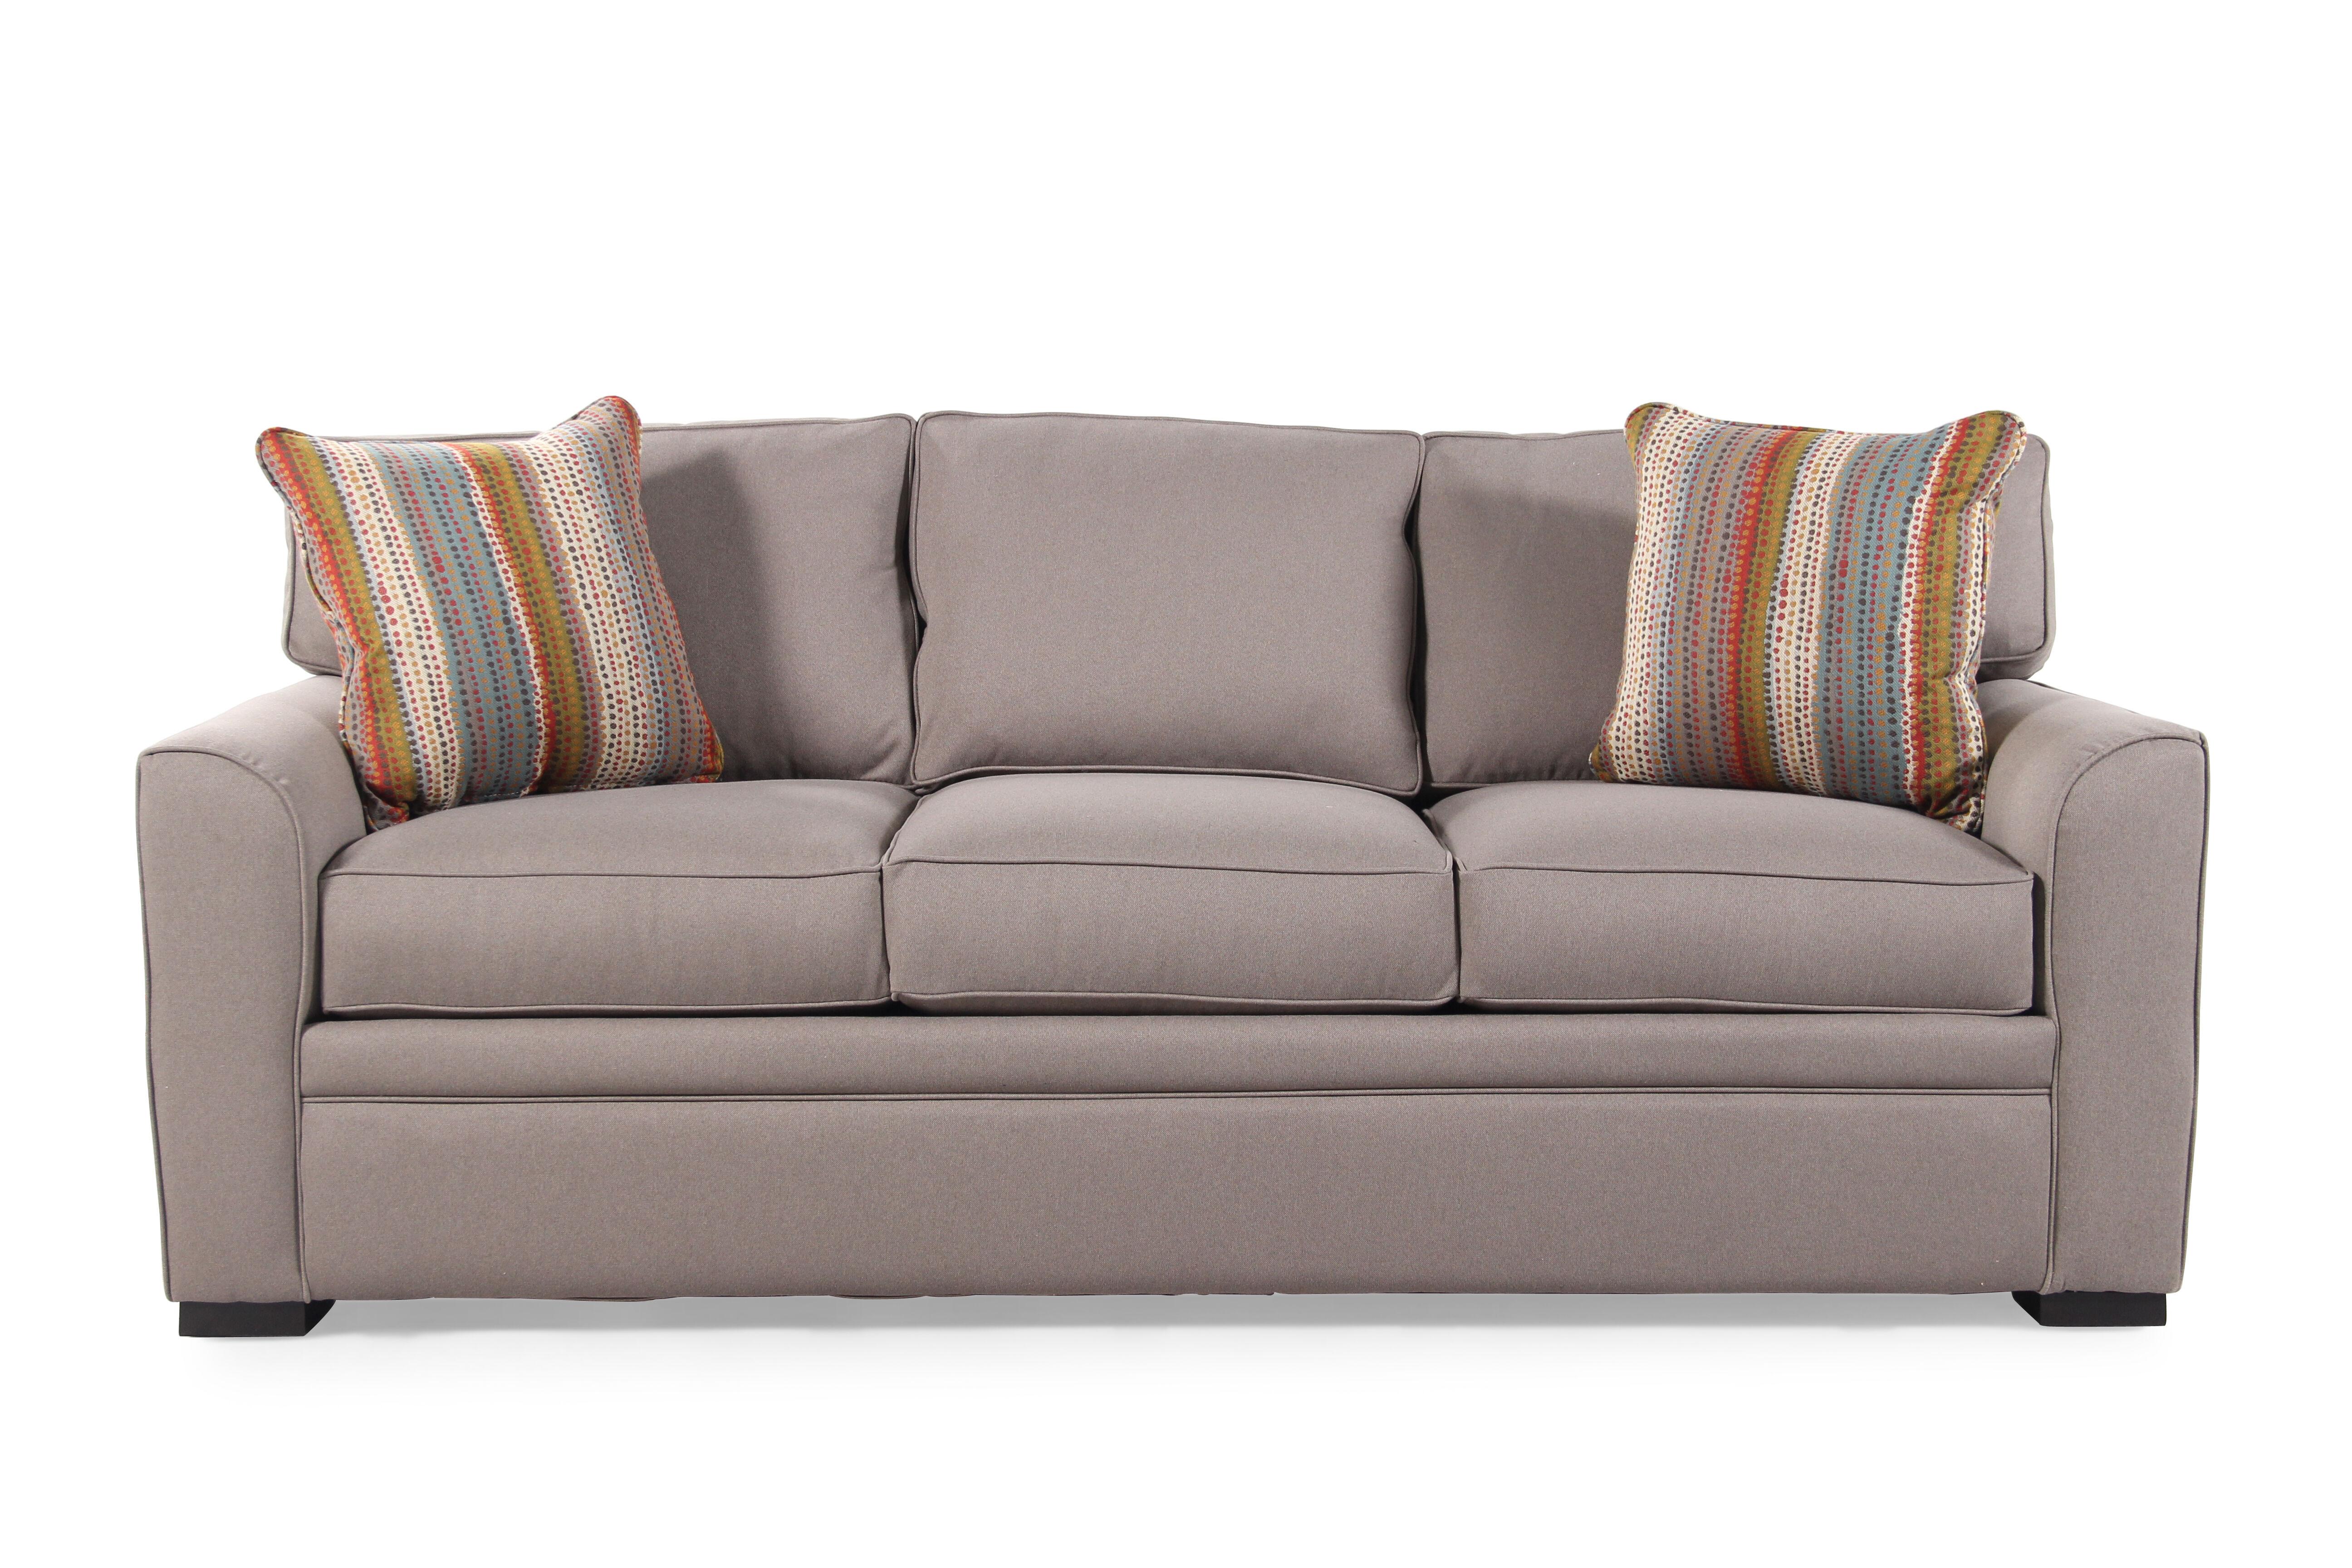 100 tempurpedic sleeper sofas dreamliner top grain leather queen rh sitio forgent cl